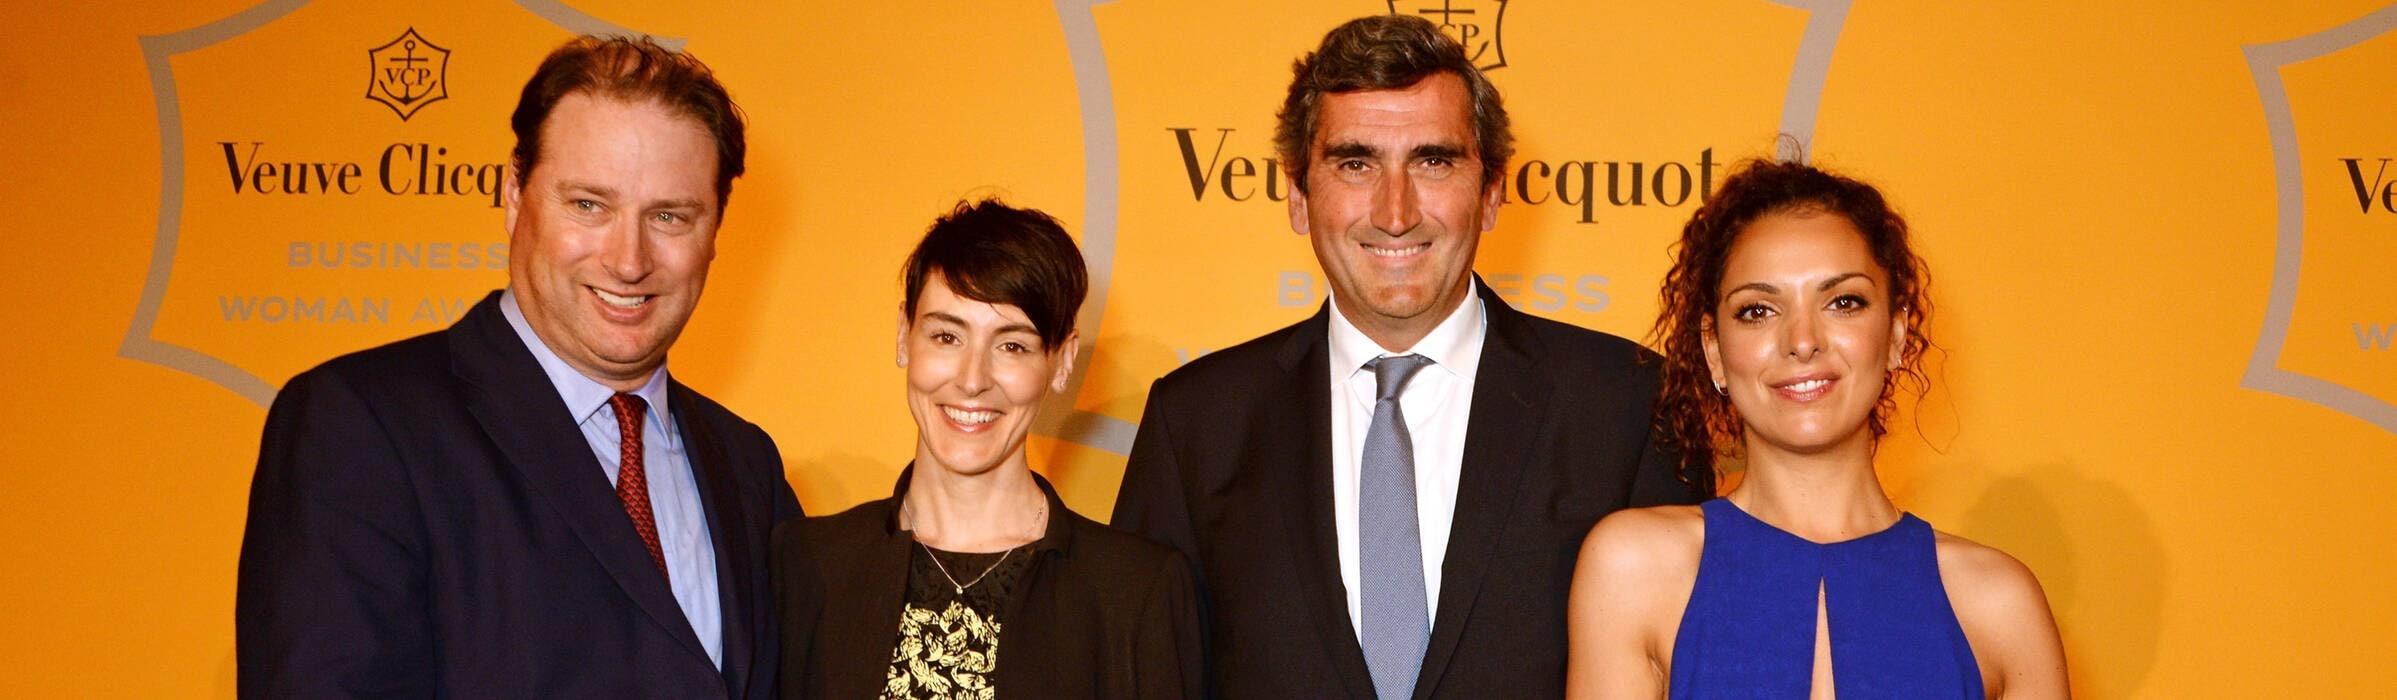 Veuve Clicquot - Business Woman Award